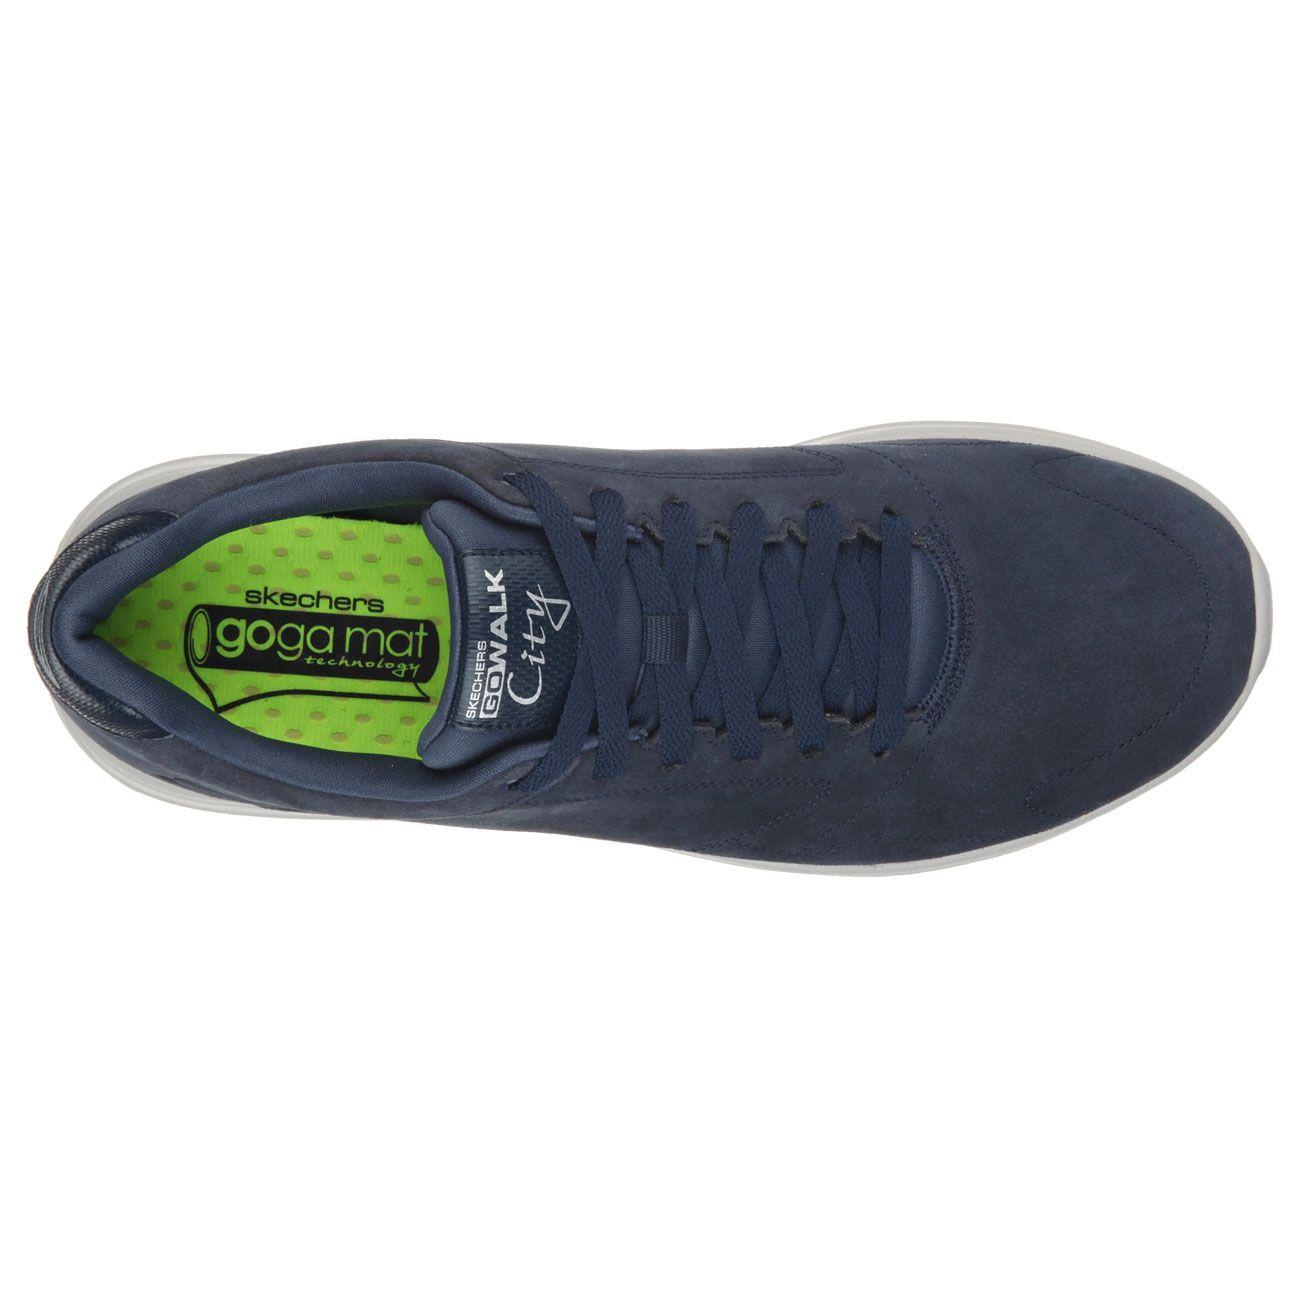 Men's and Women's Ergonomically Designed Comfort Footwear